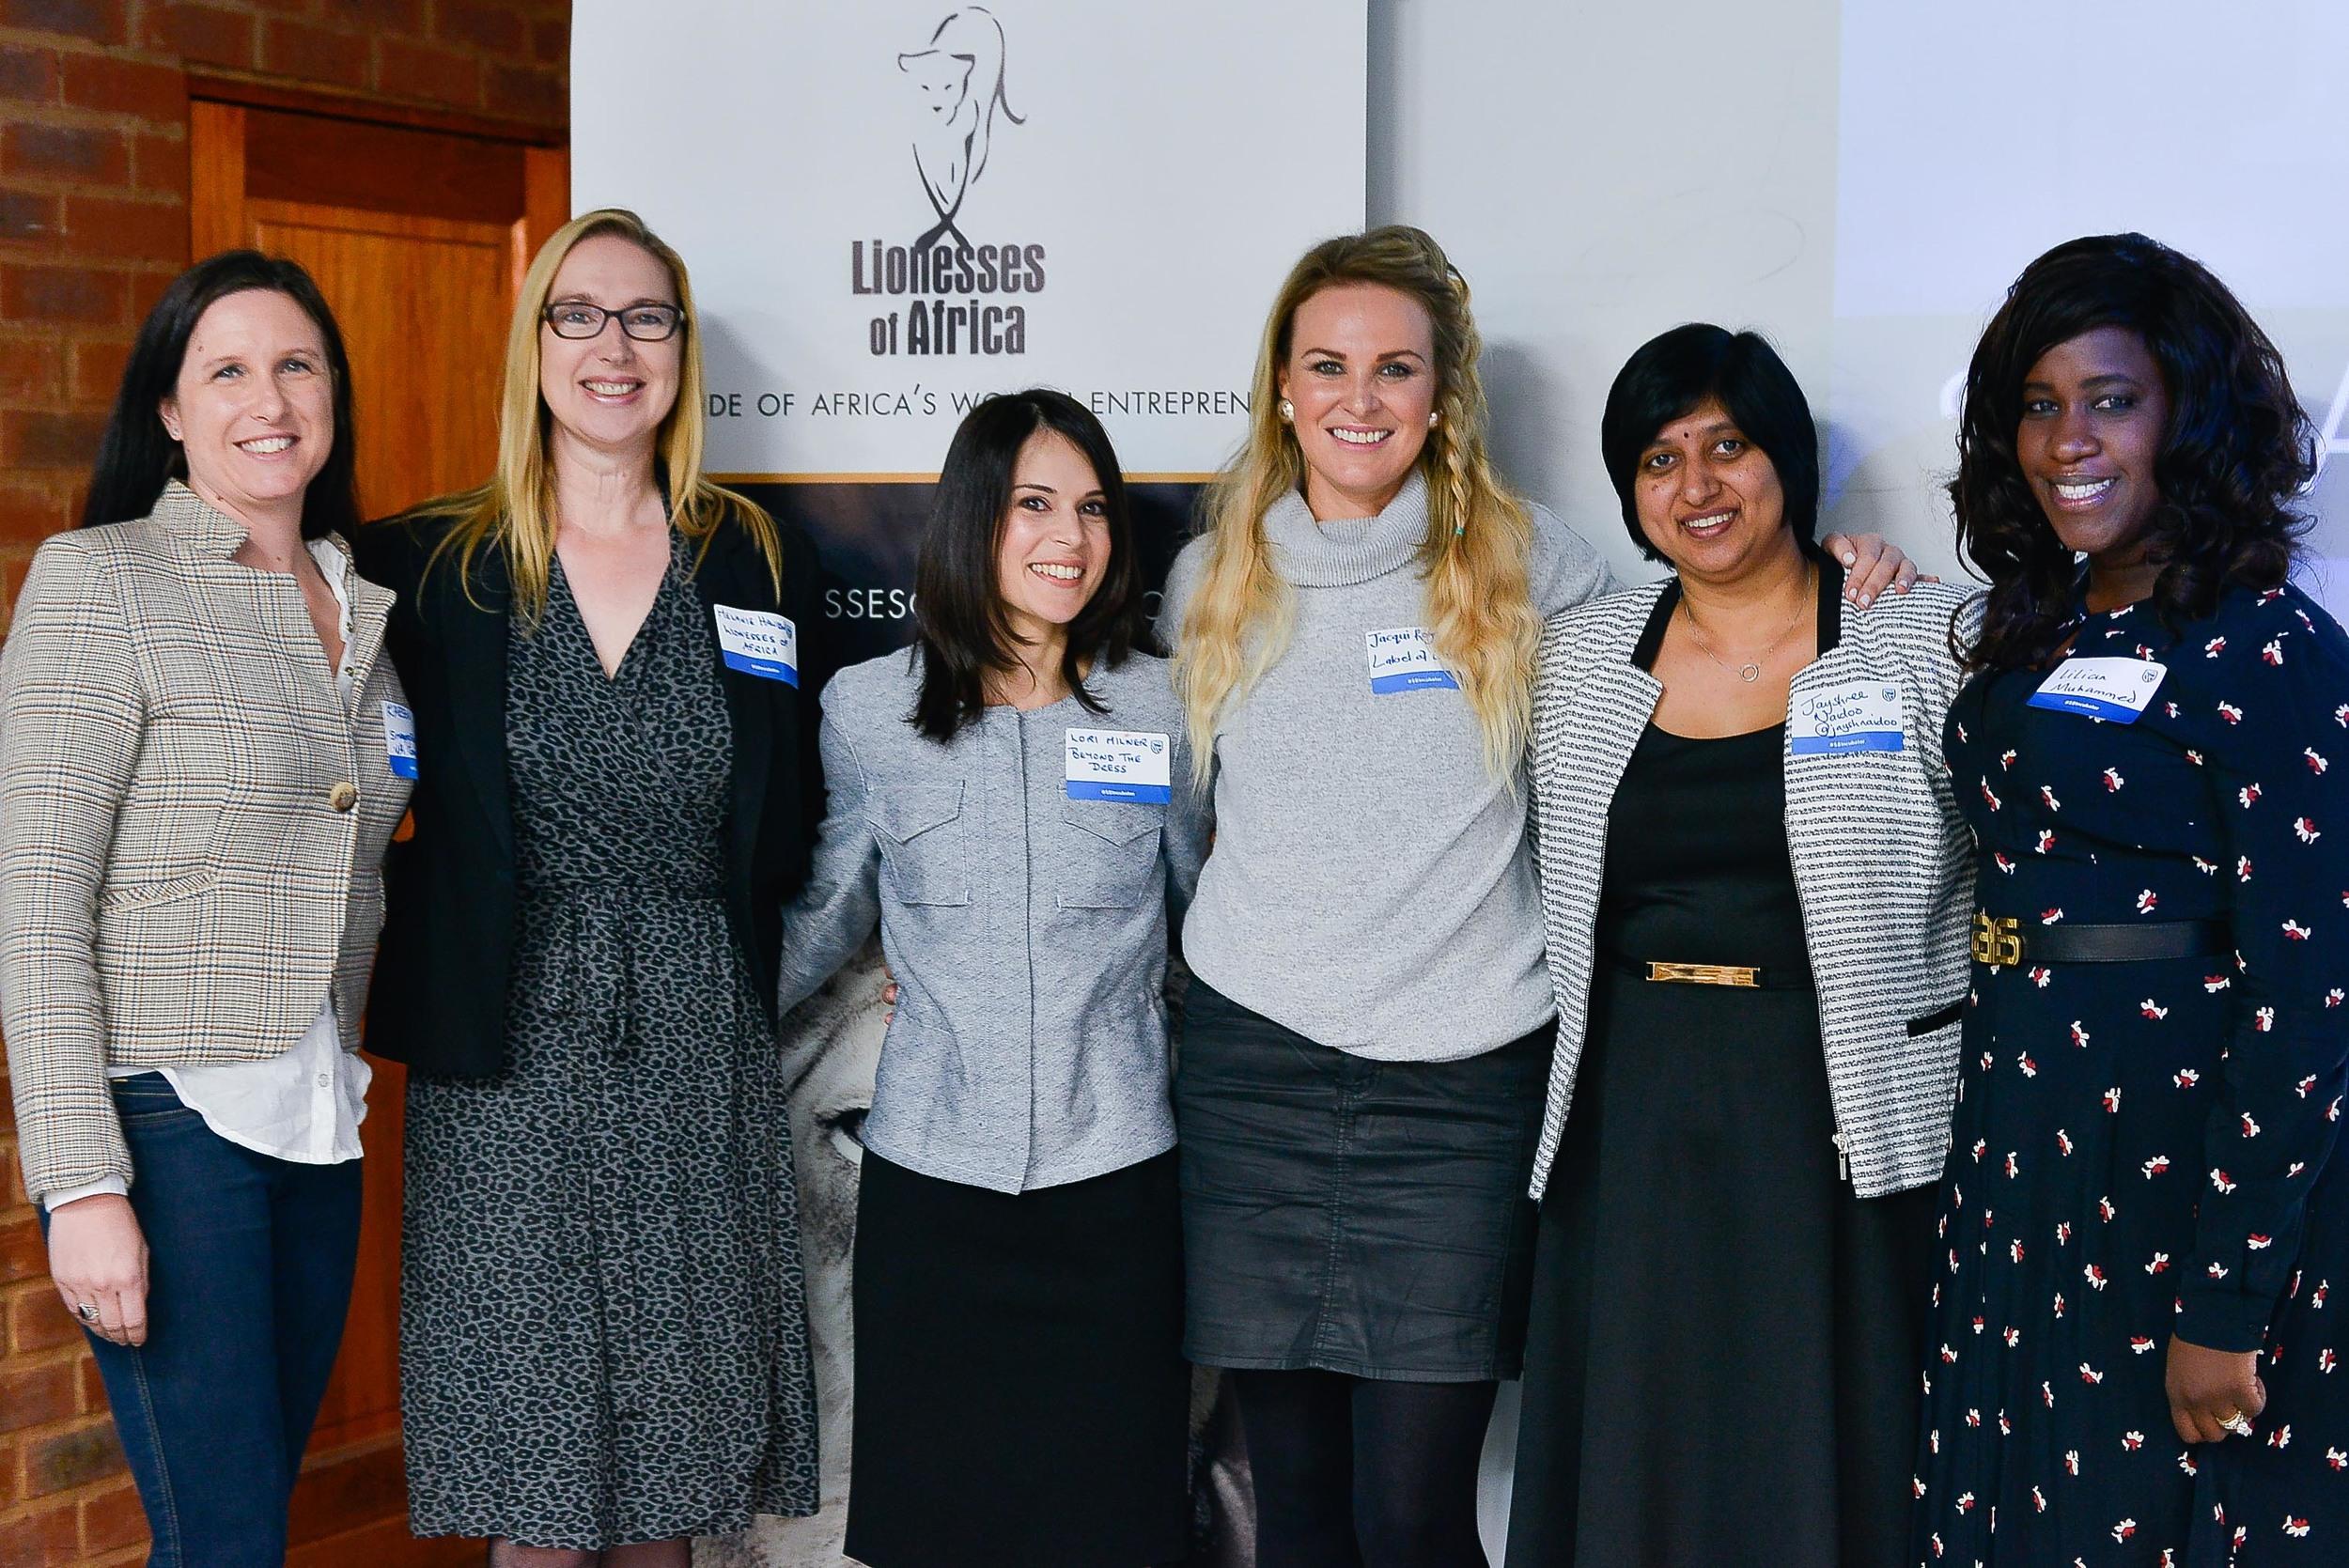 Speakers L-R: Karen Wessels, Melanie Hawken, Lori Milner, Jacqueline Rogers, Jayshree Naidoo,Lilian Muhammed